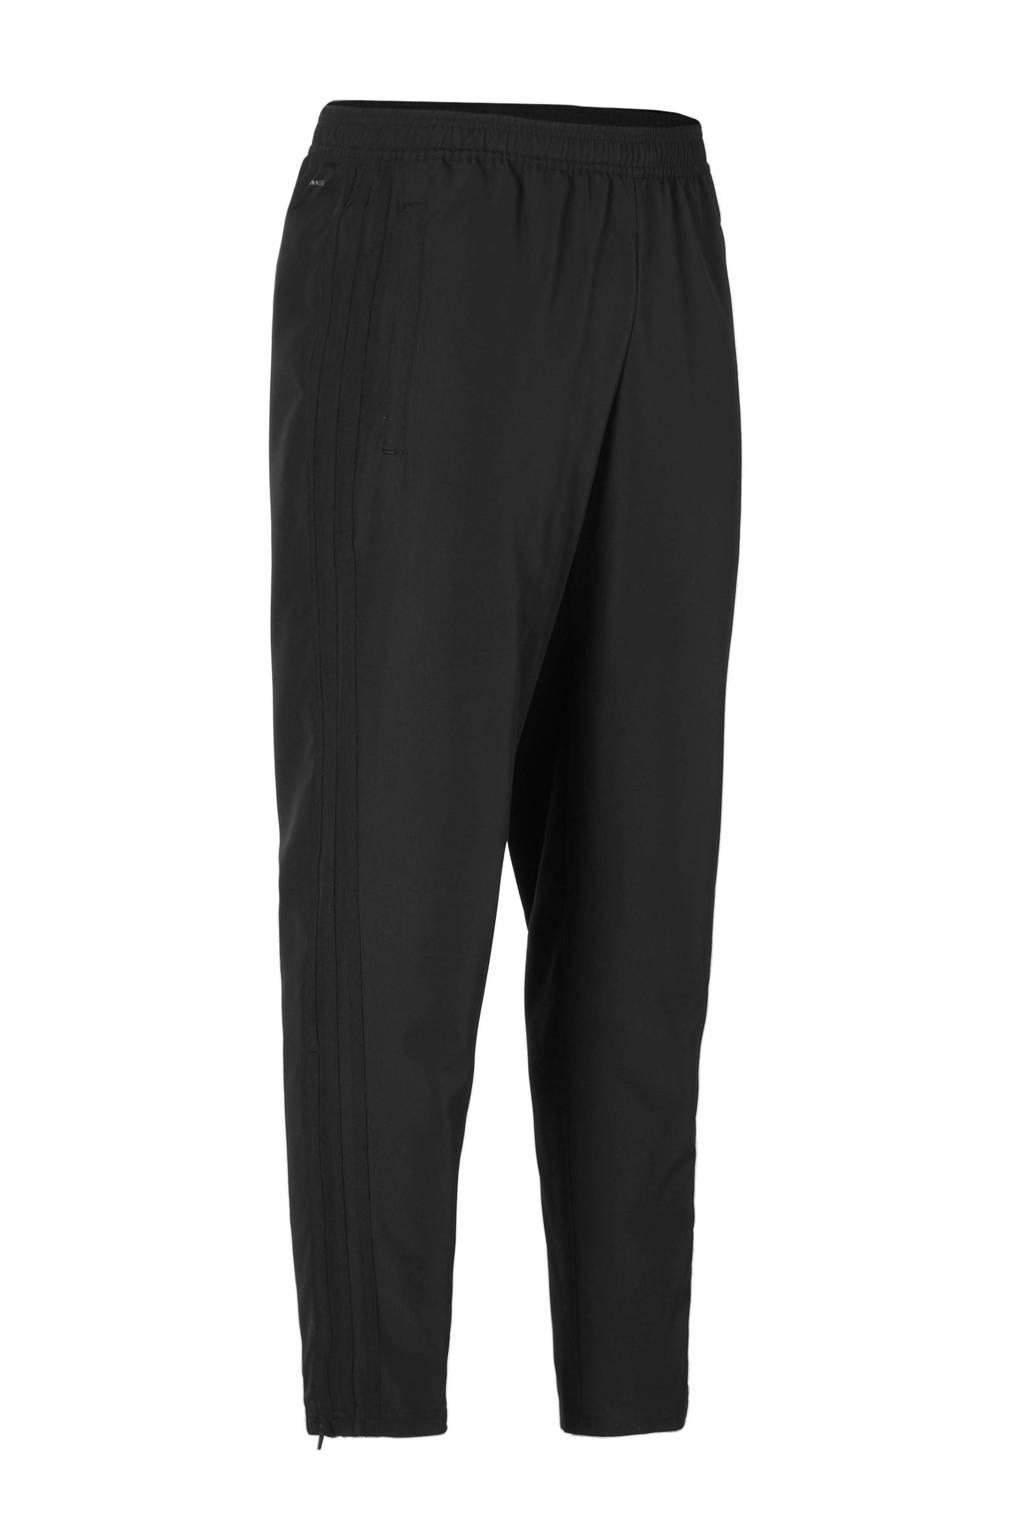 adidas   geweven sportbroek Con18 zwart, Zwart